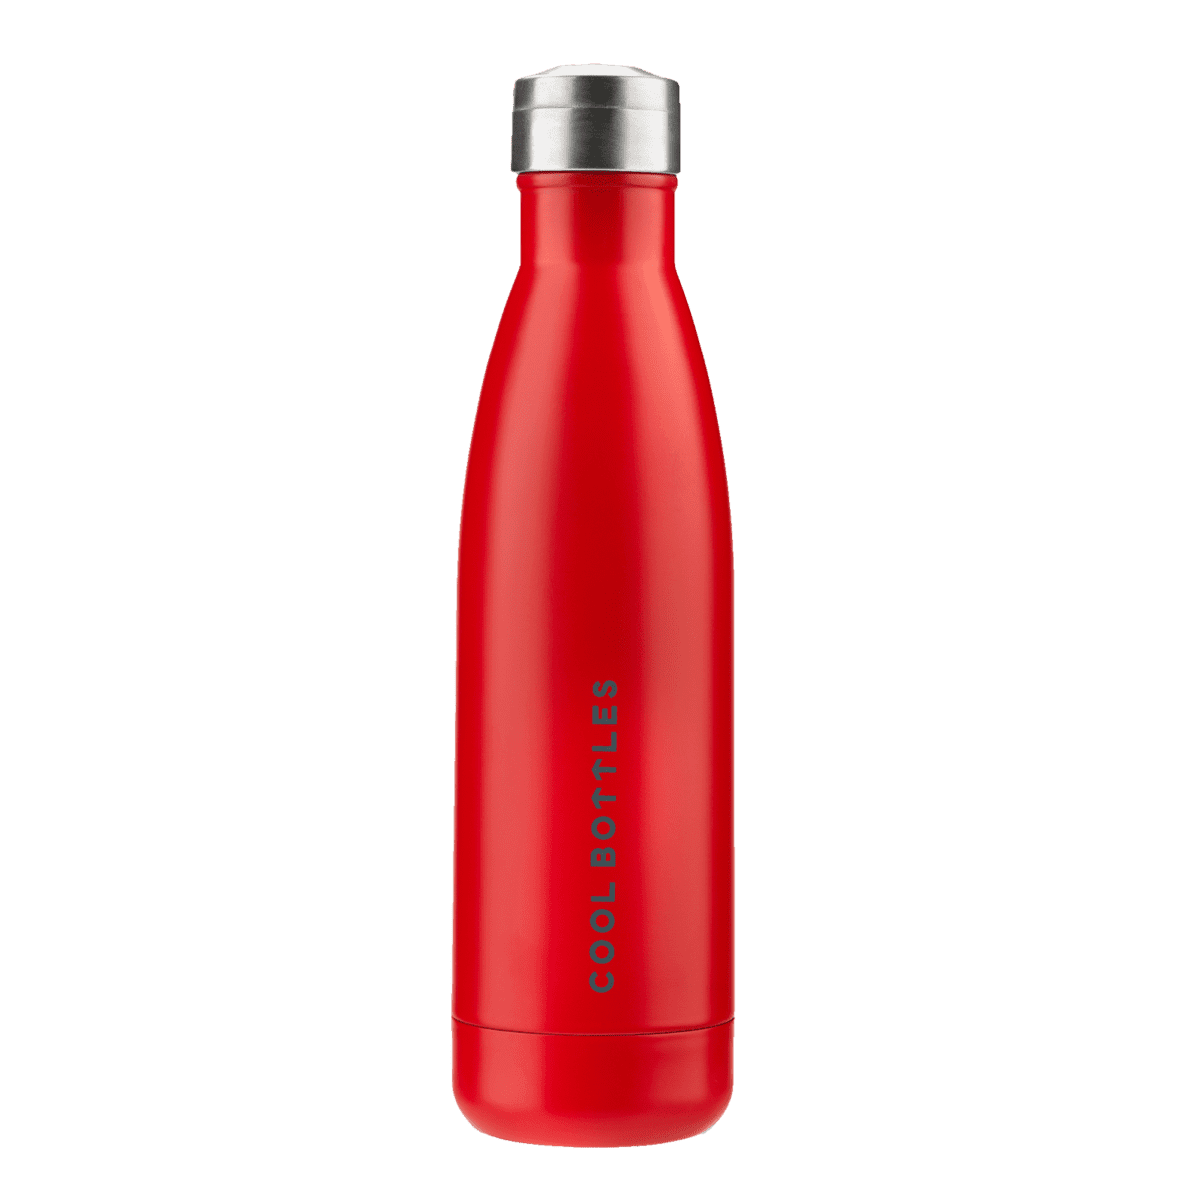 Vivid_Red-cool-bottles-02